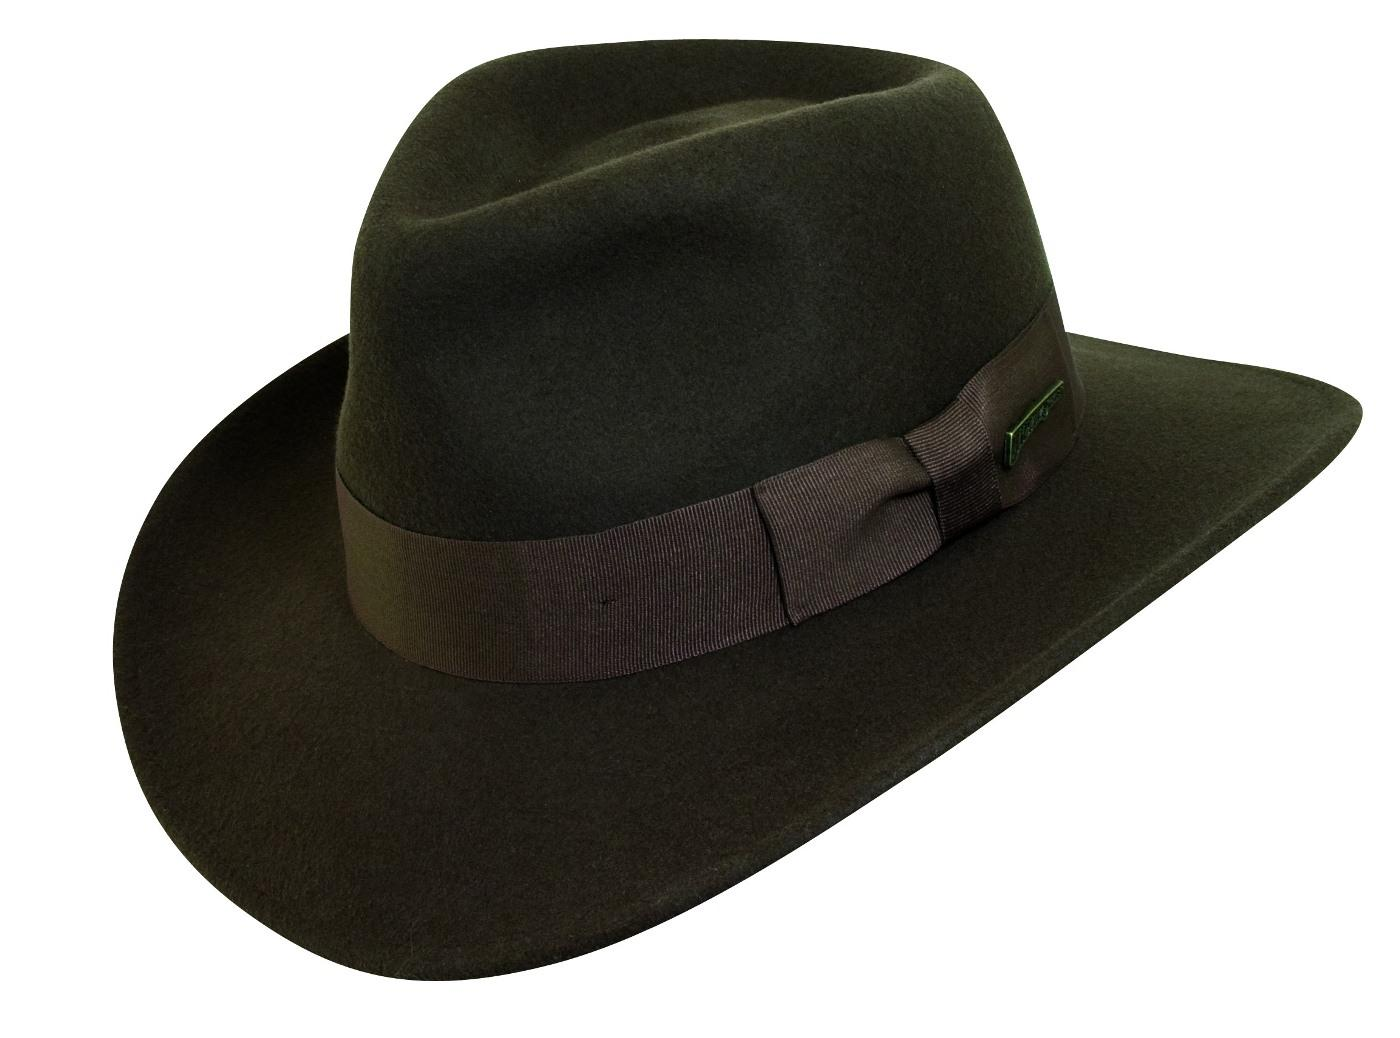 2ce7b6b9d2dd6 Dorfman Pacific Men s Indiana Jones Wool Felt Crushable Outback Hat